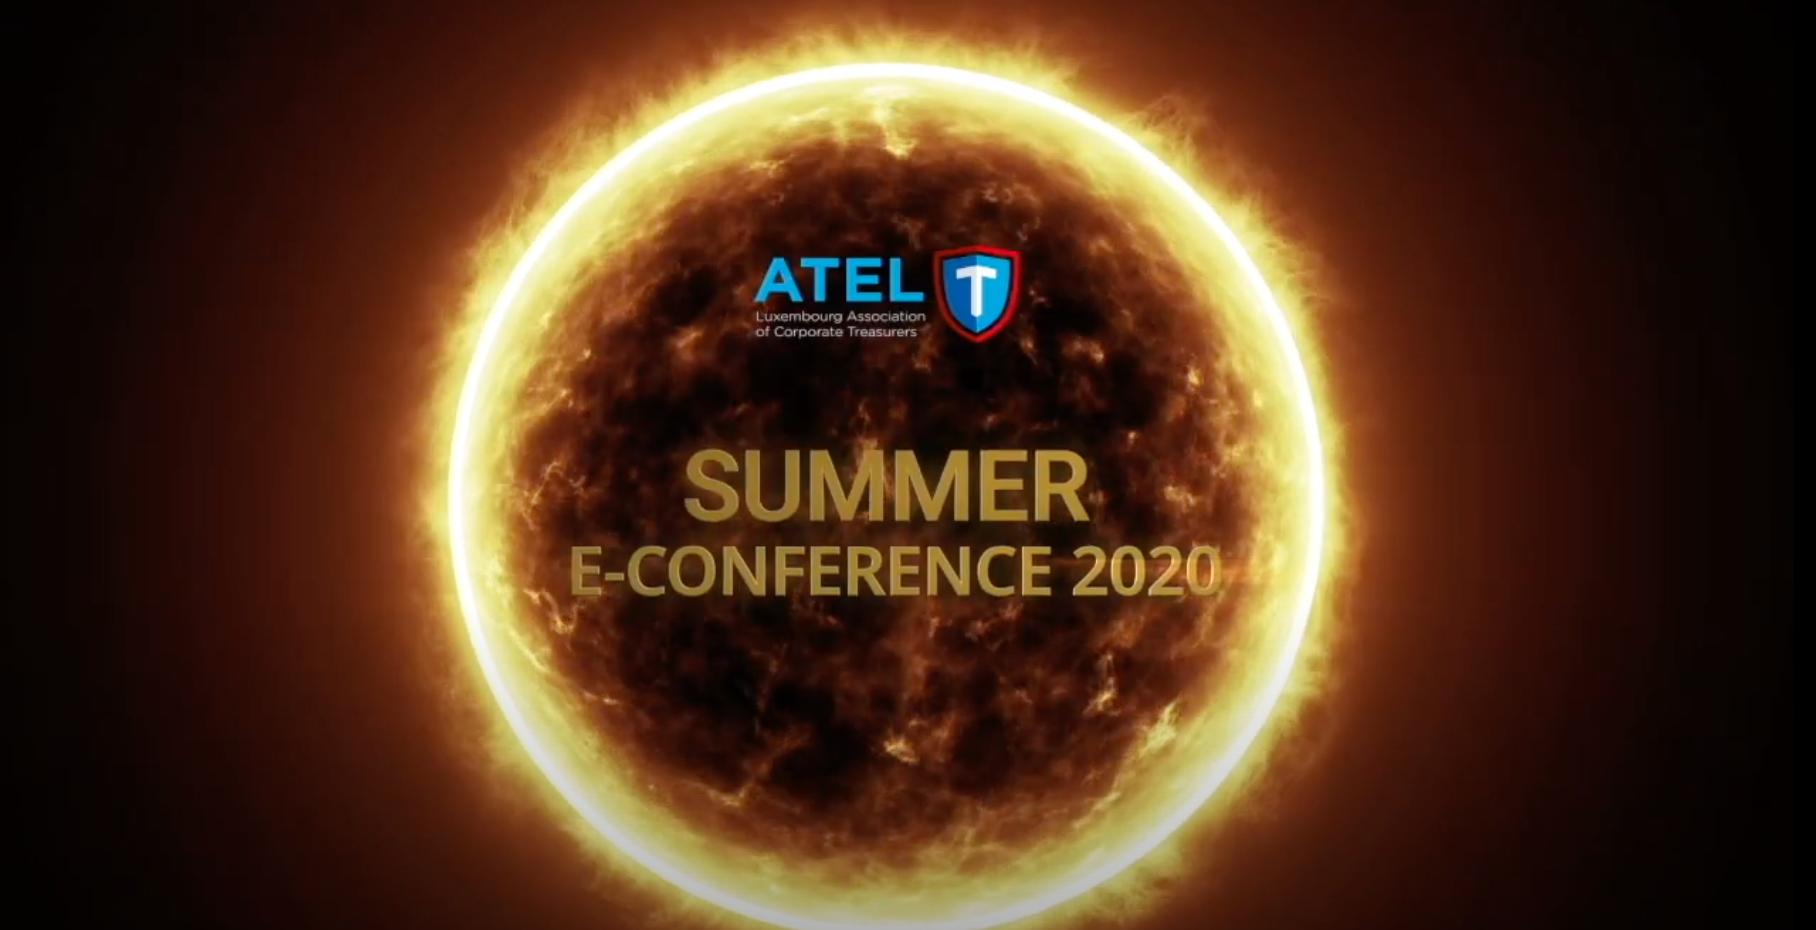 ATEL Summer E-Conference 2020